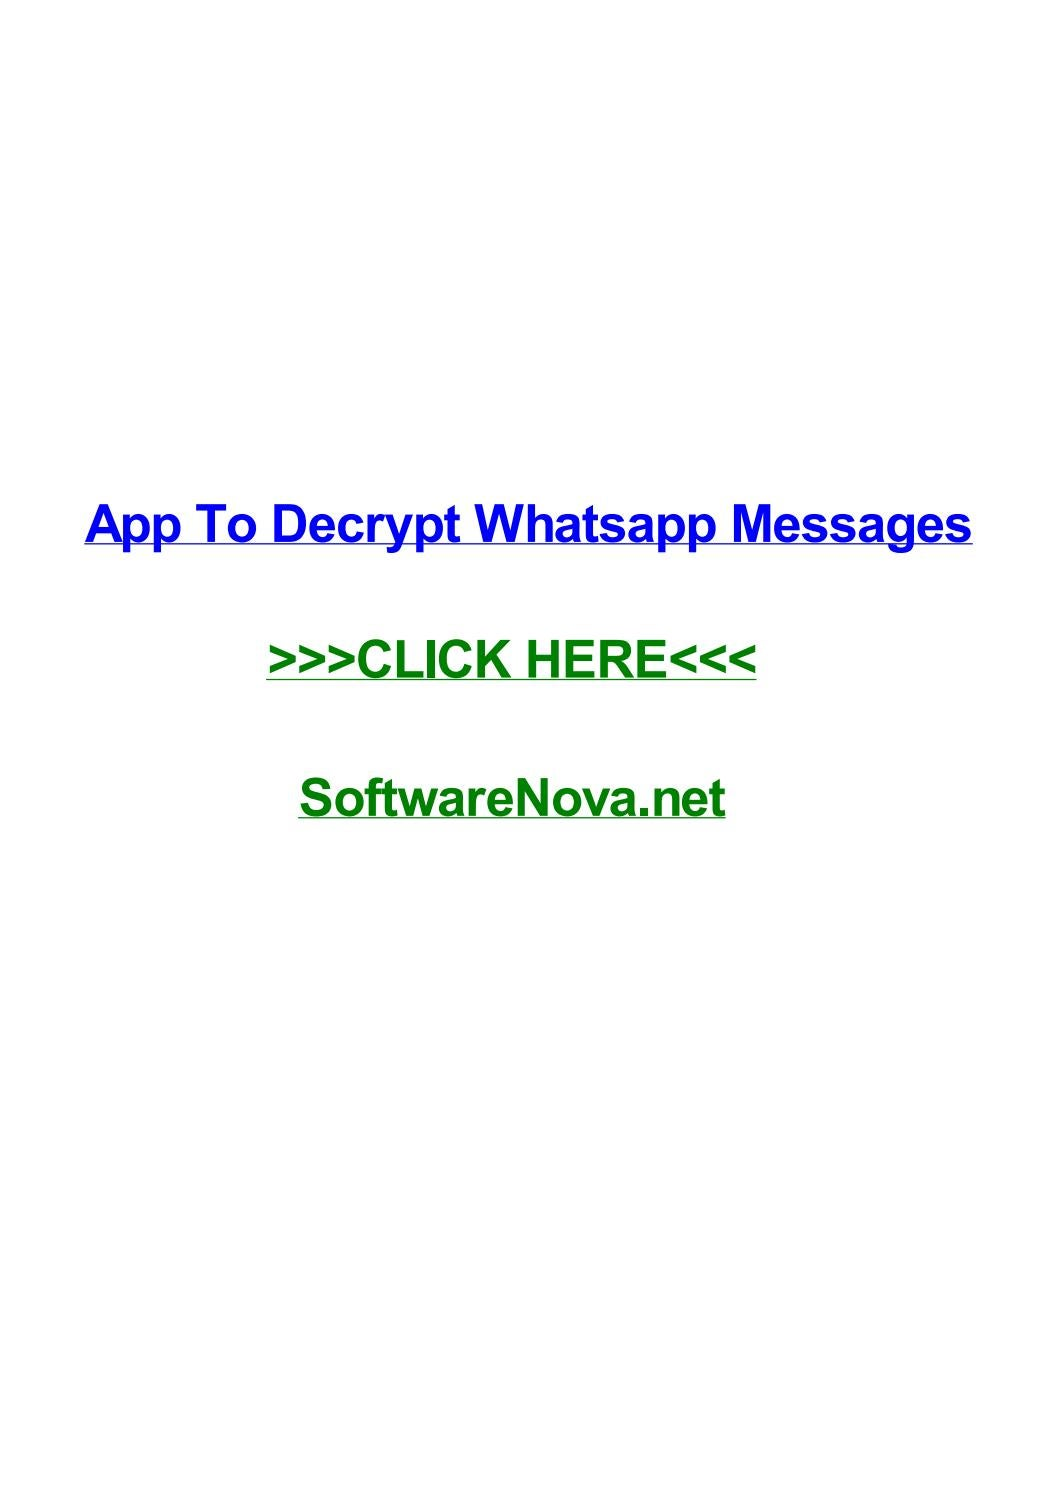 App to decrypt whatsapp messages by howardrihlg - issuu